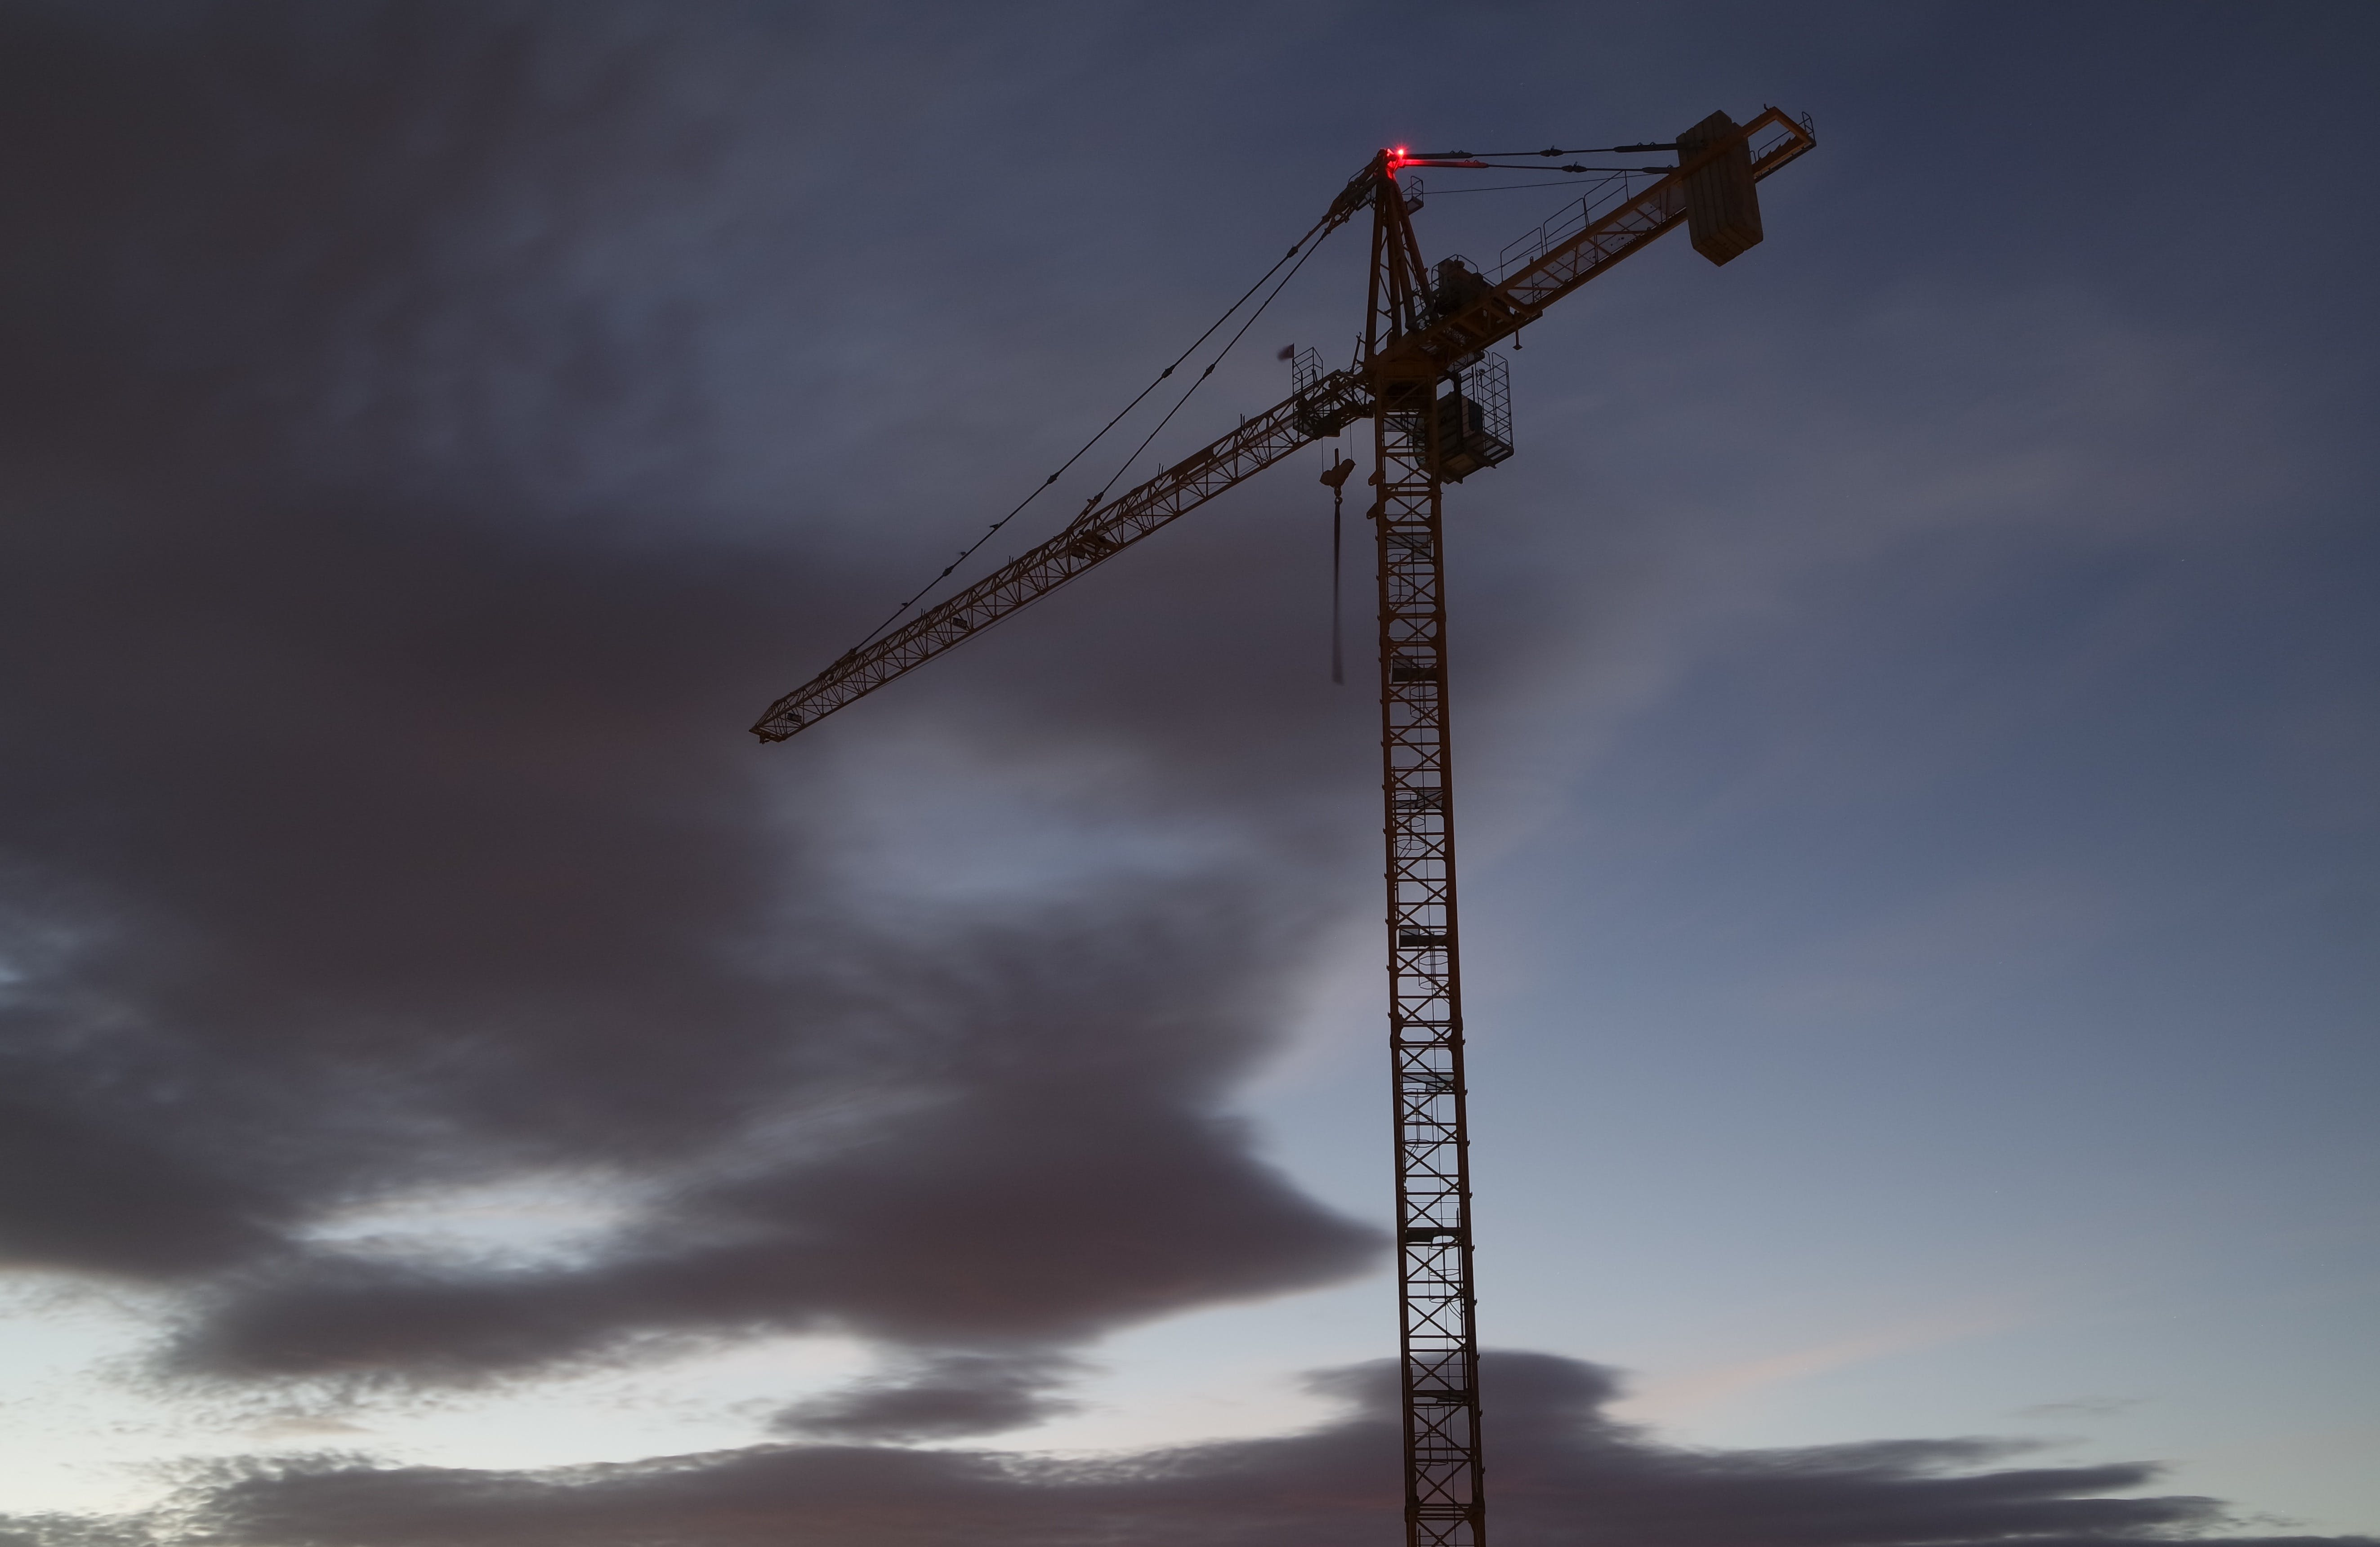 Tower Crane at Nighttime